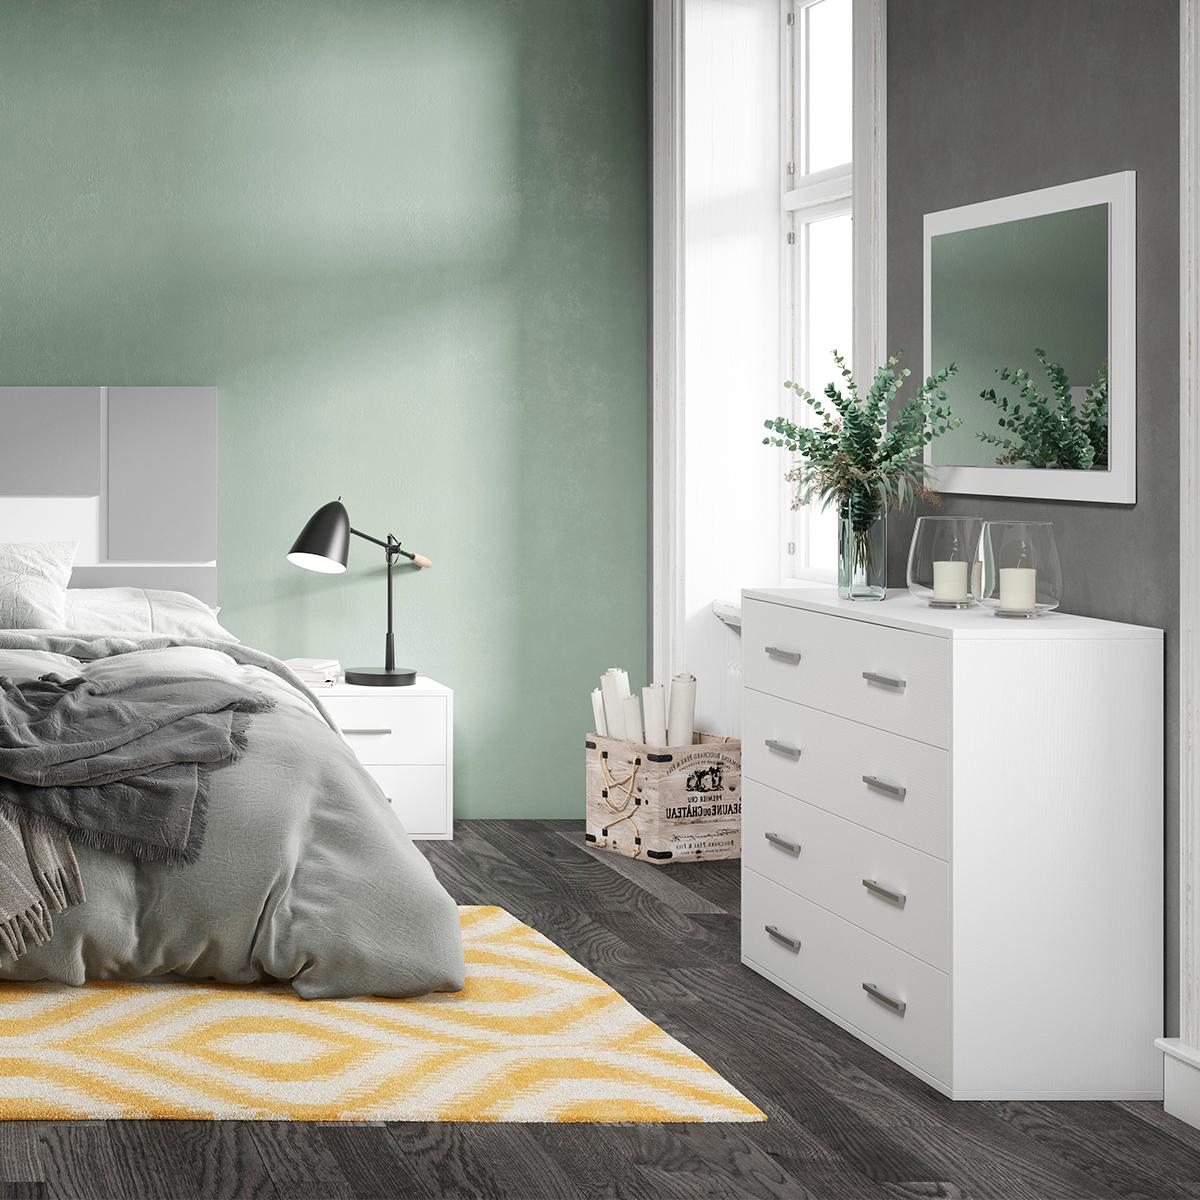 Dormitorio de matrimonio New Plus 03 comoda y espejo